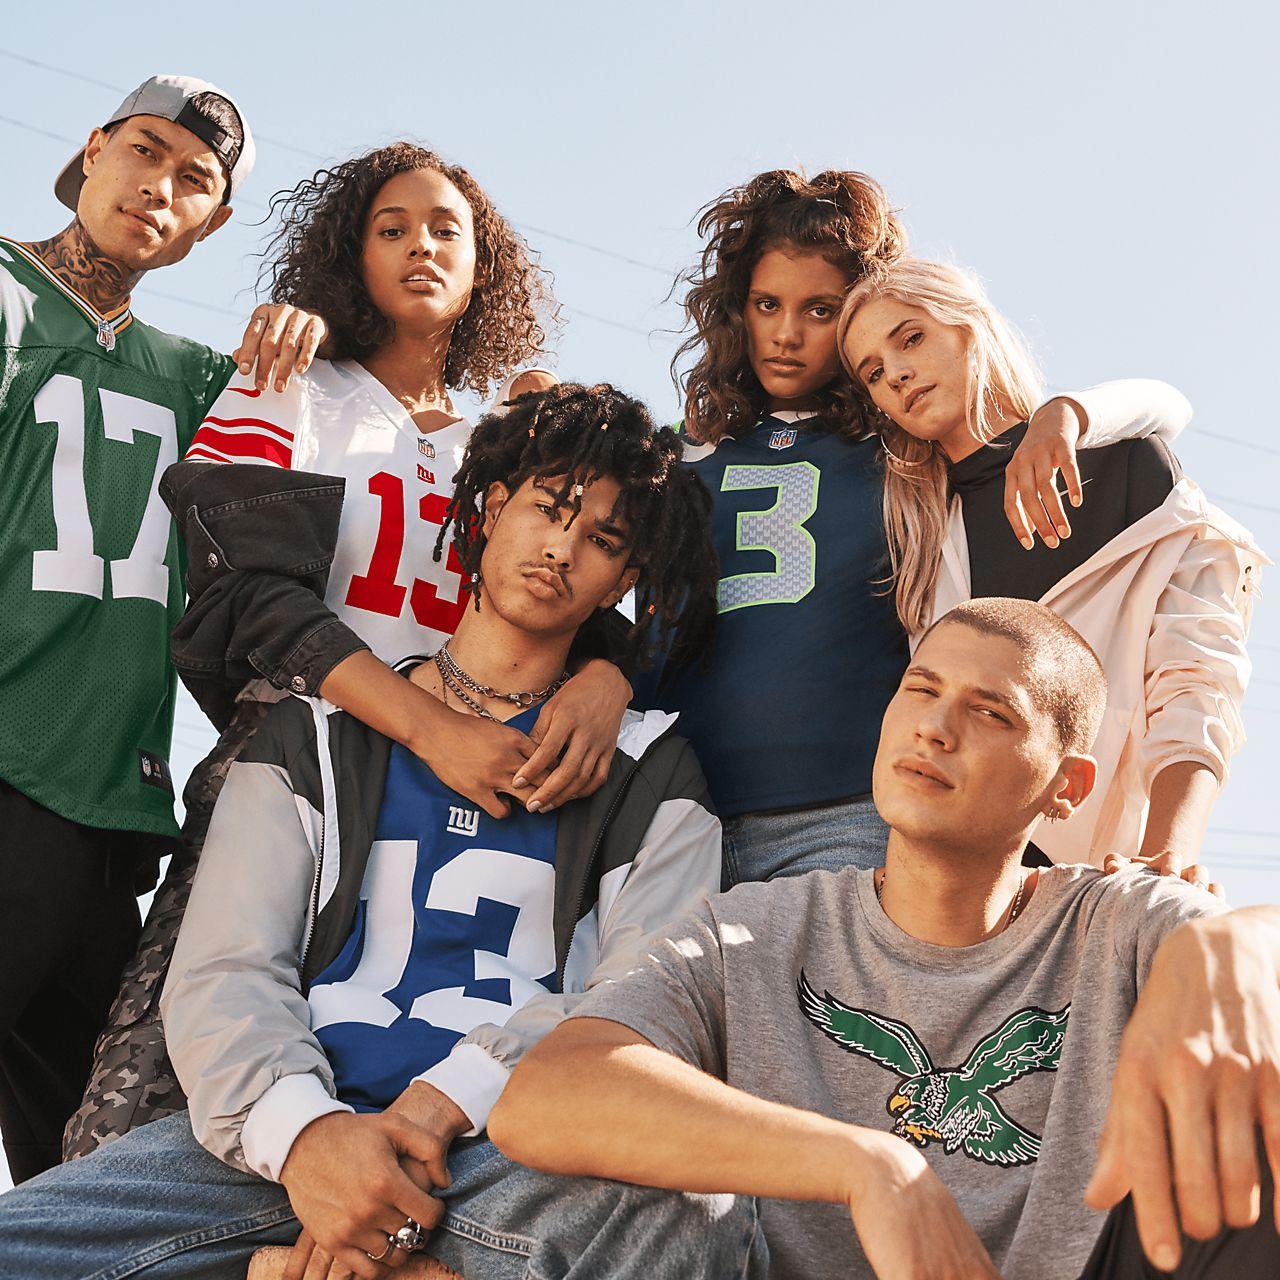 61478a6b4d1 ... NFL Seattle Seahawks Limited Vapor Untouchable (Russell Wilson) Women's  Football Jersey